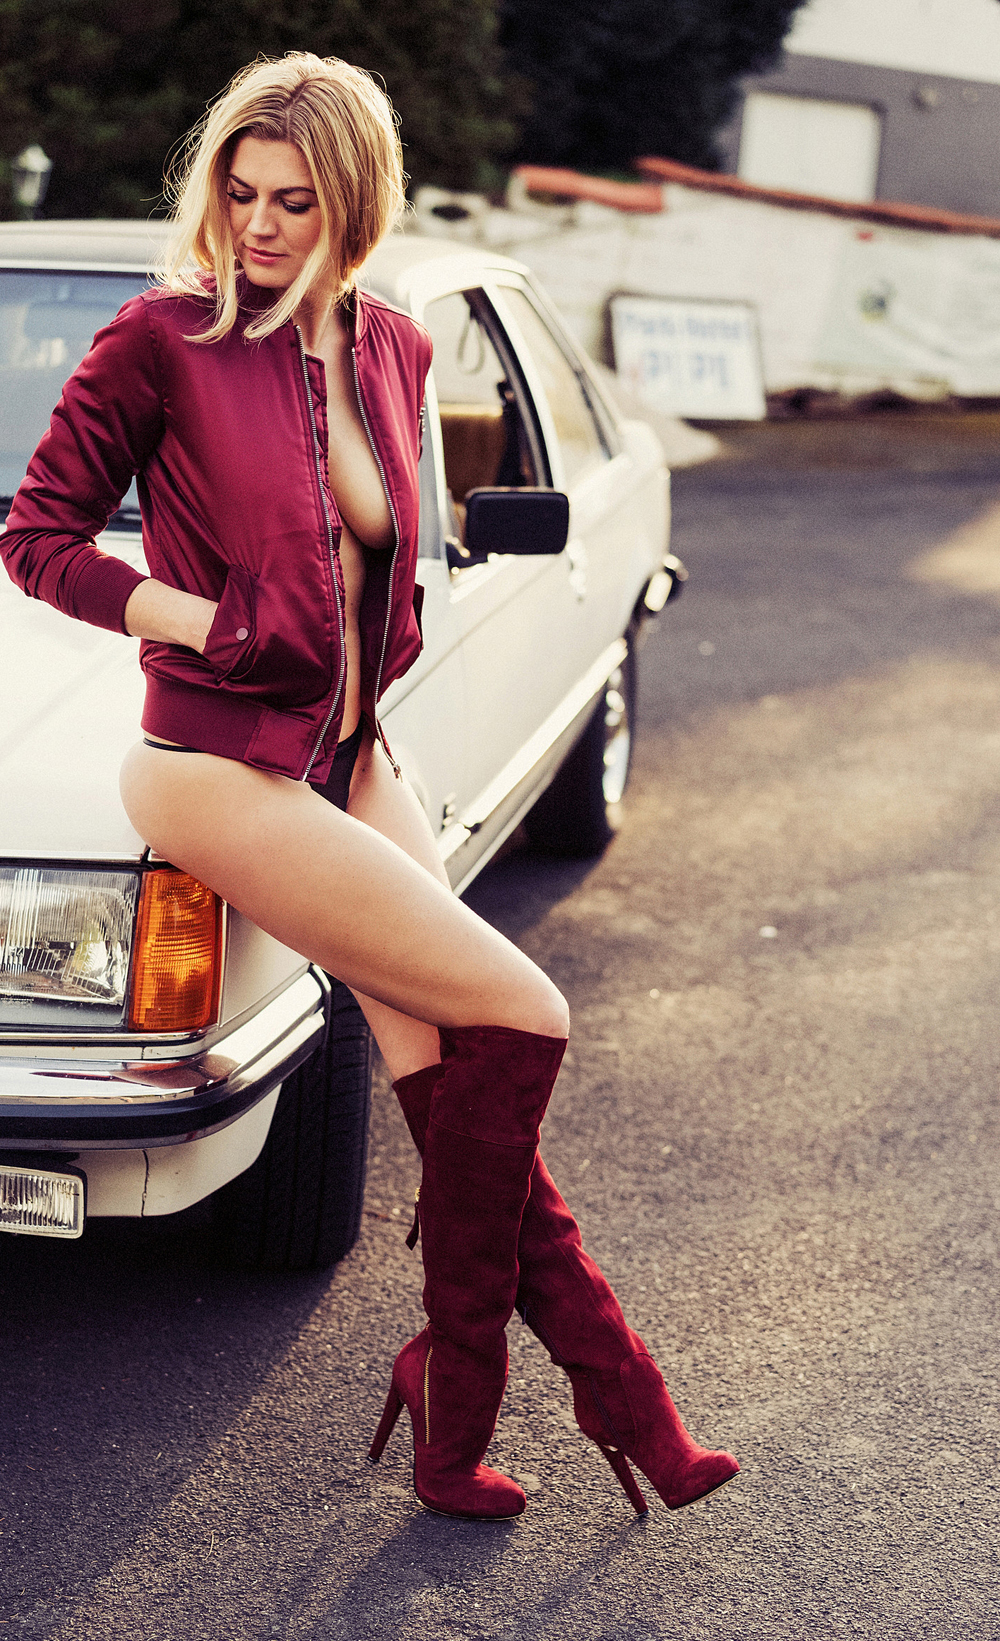 Nina bott playboy bilder nackt